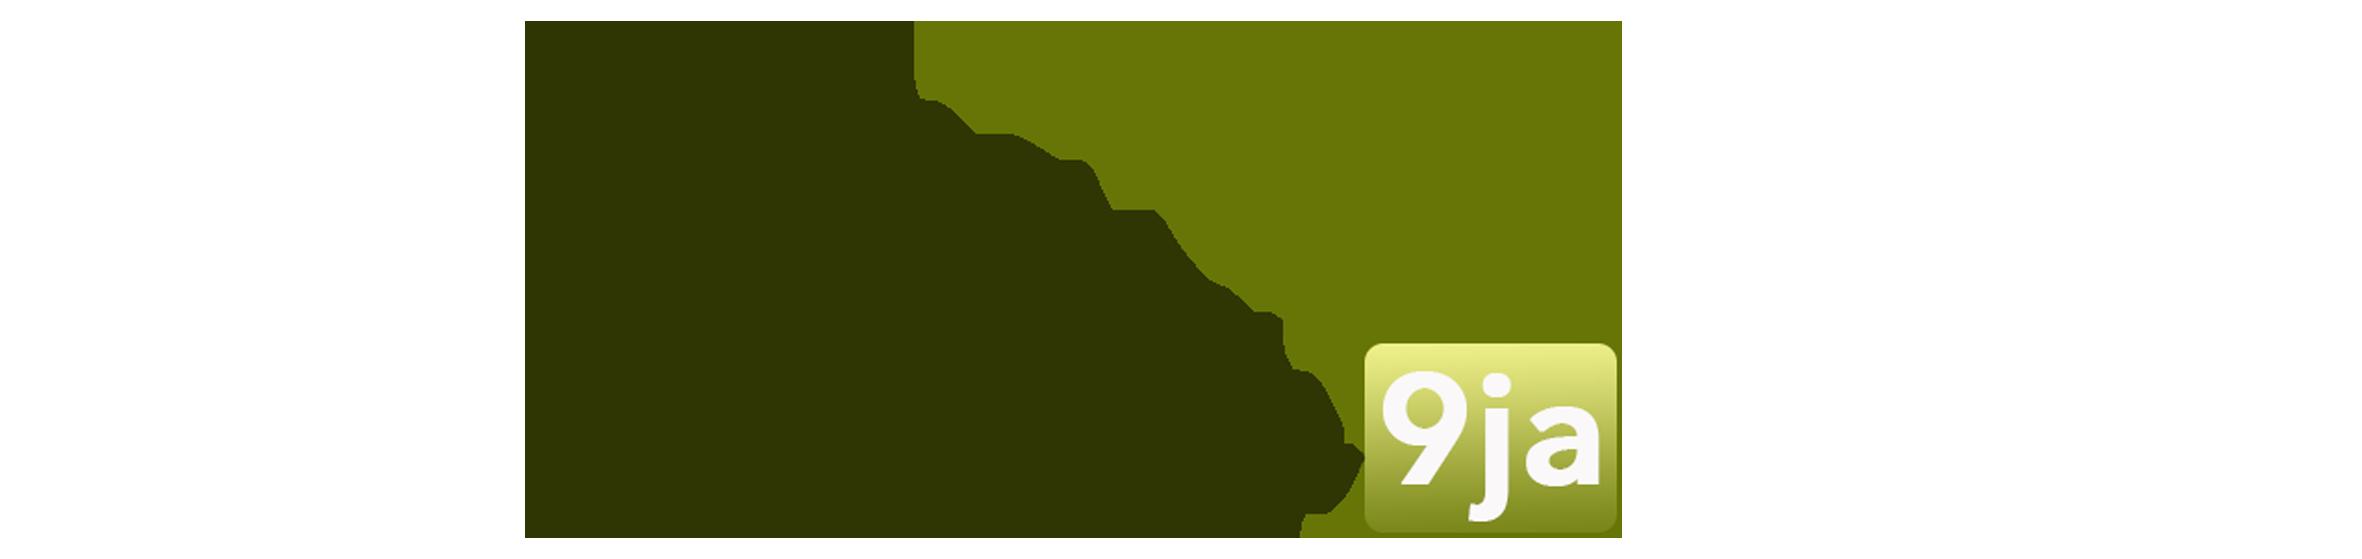 Destination9ja